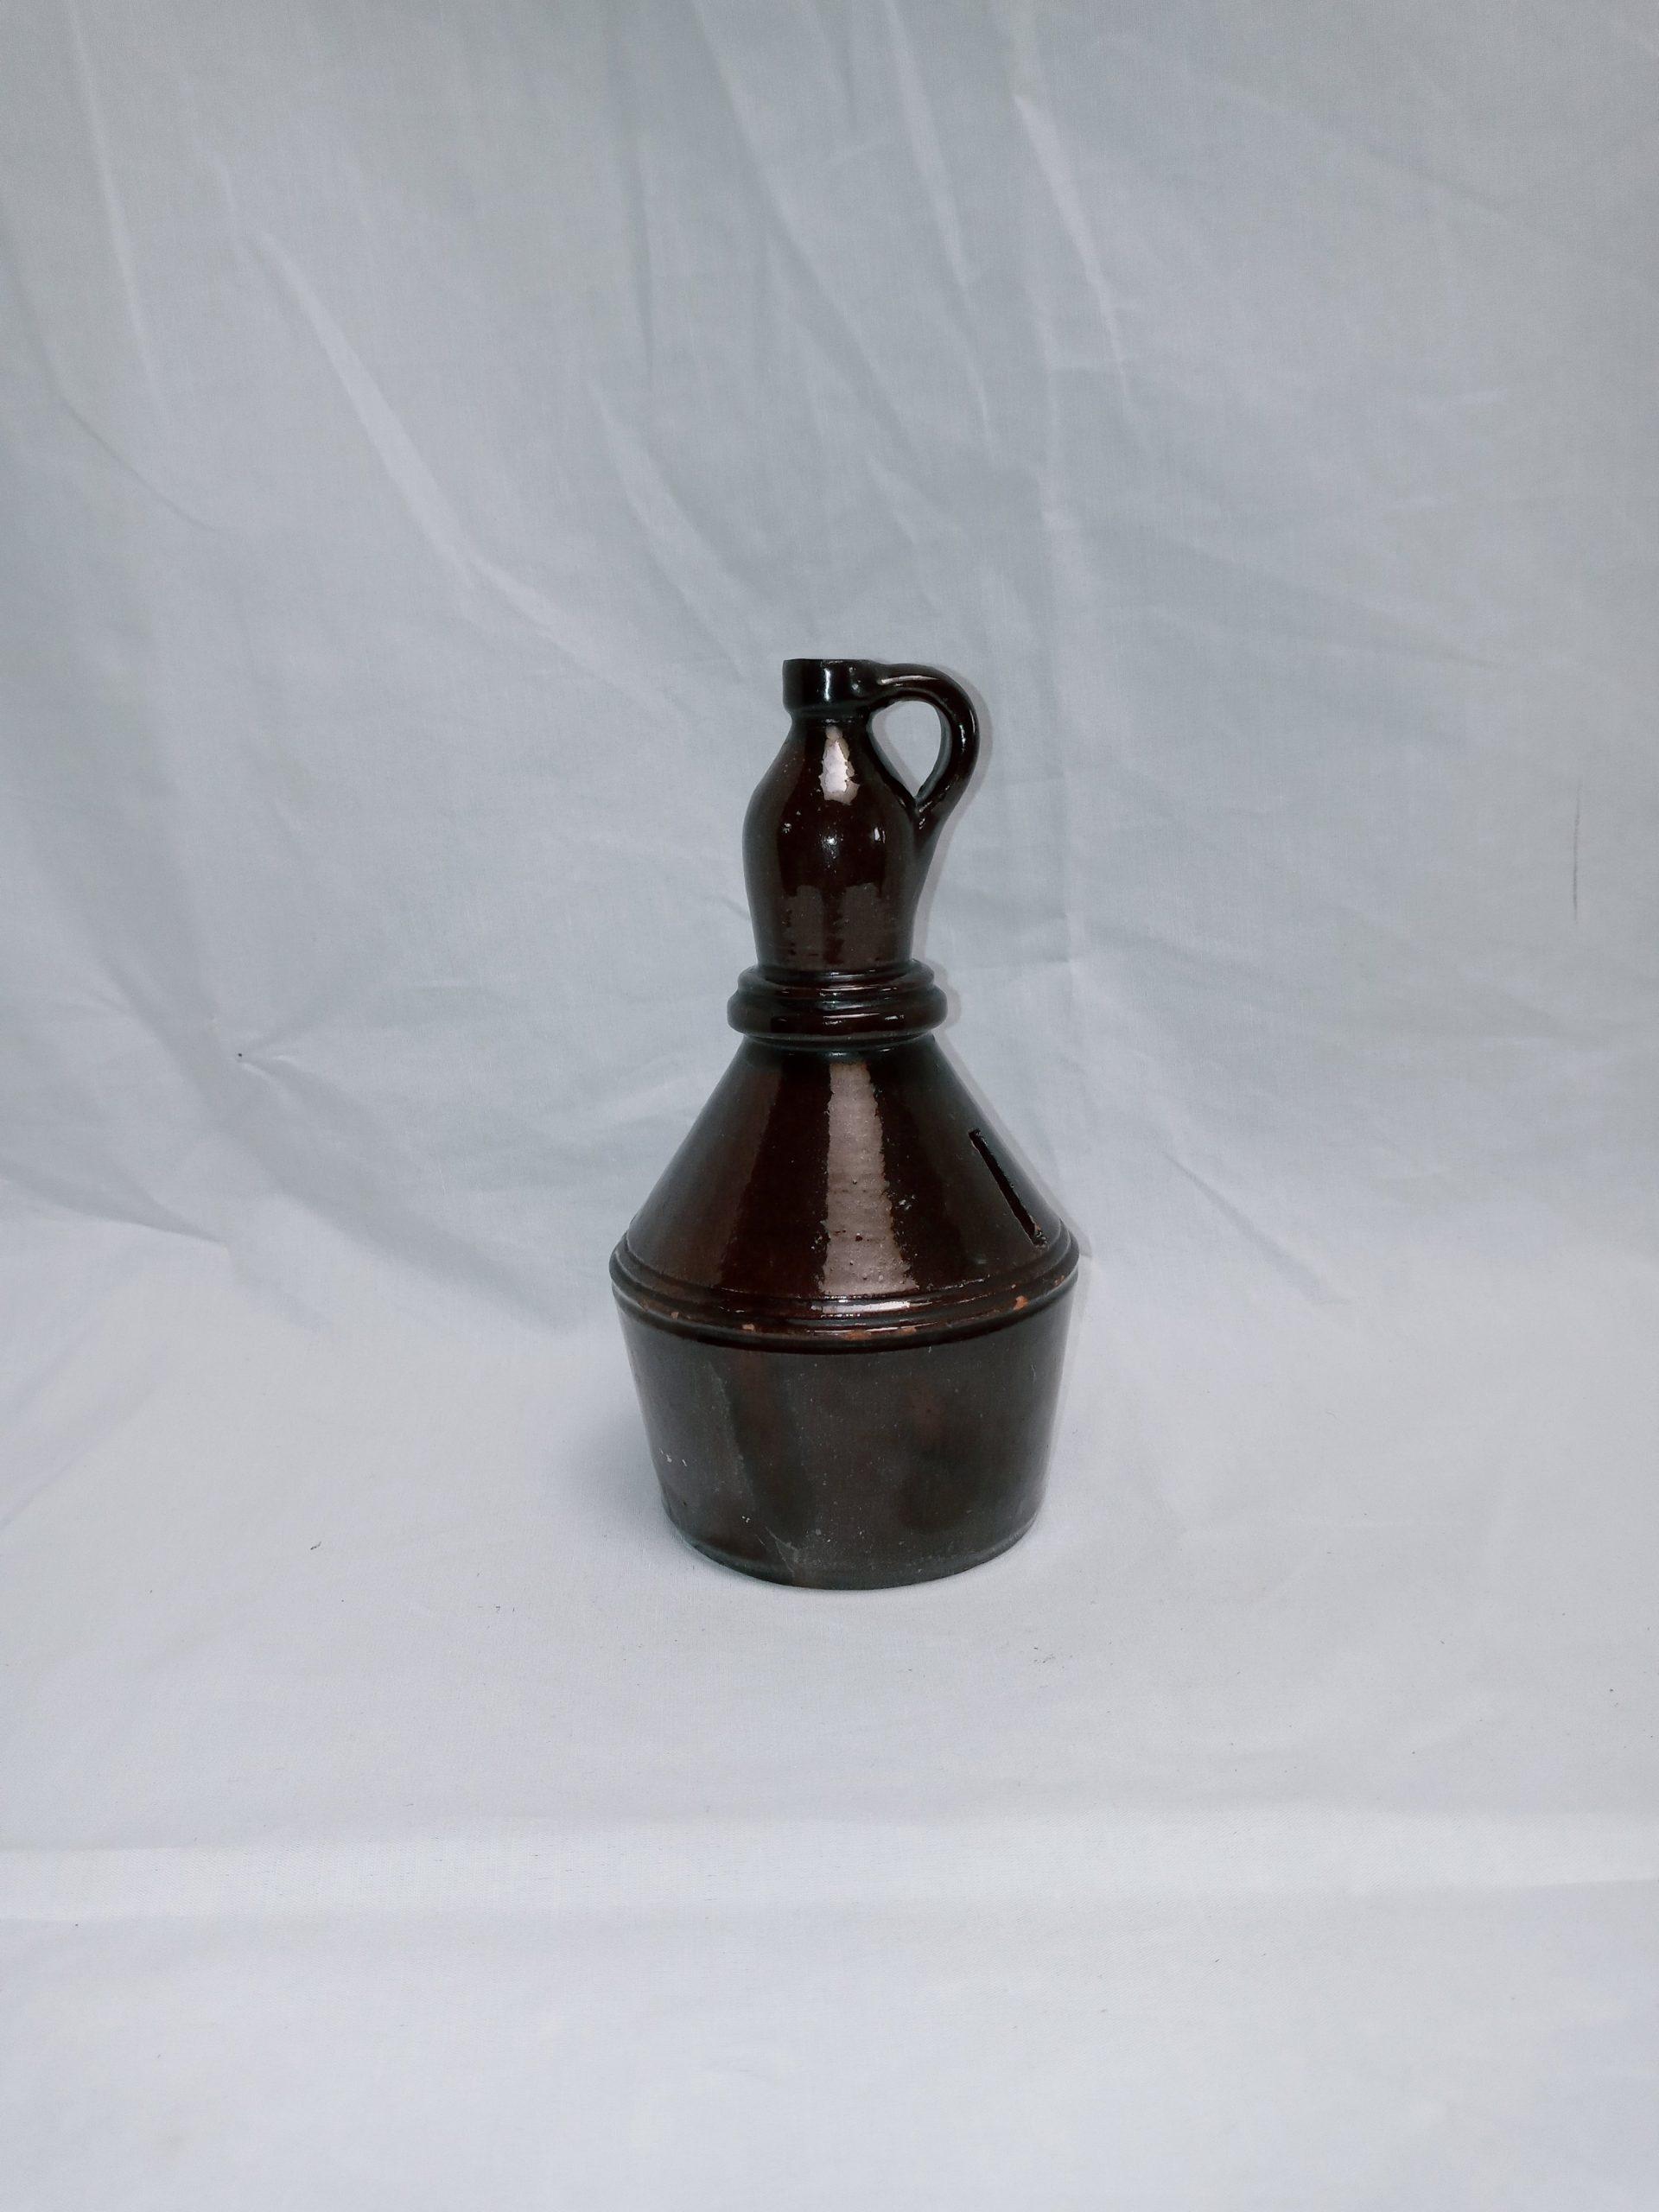 19-34729 Rare small Pennsylvania Redware Pottery Penny bank figural jug, dark managanese glaze, fine condition, 19th Century. Image